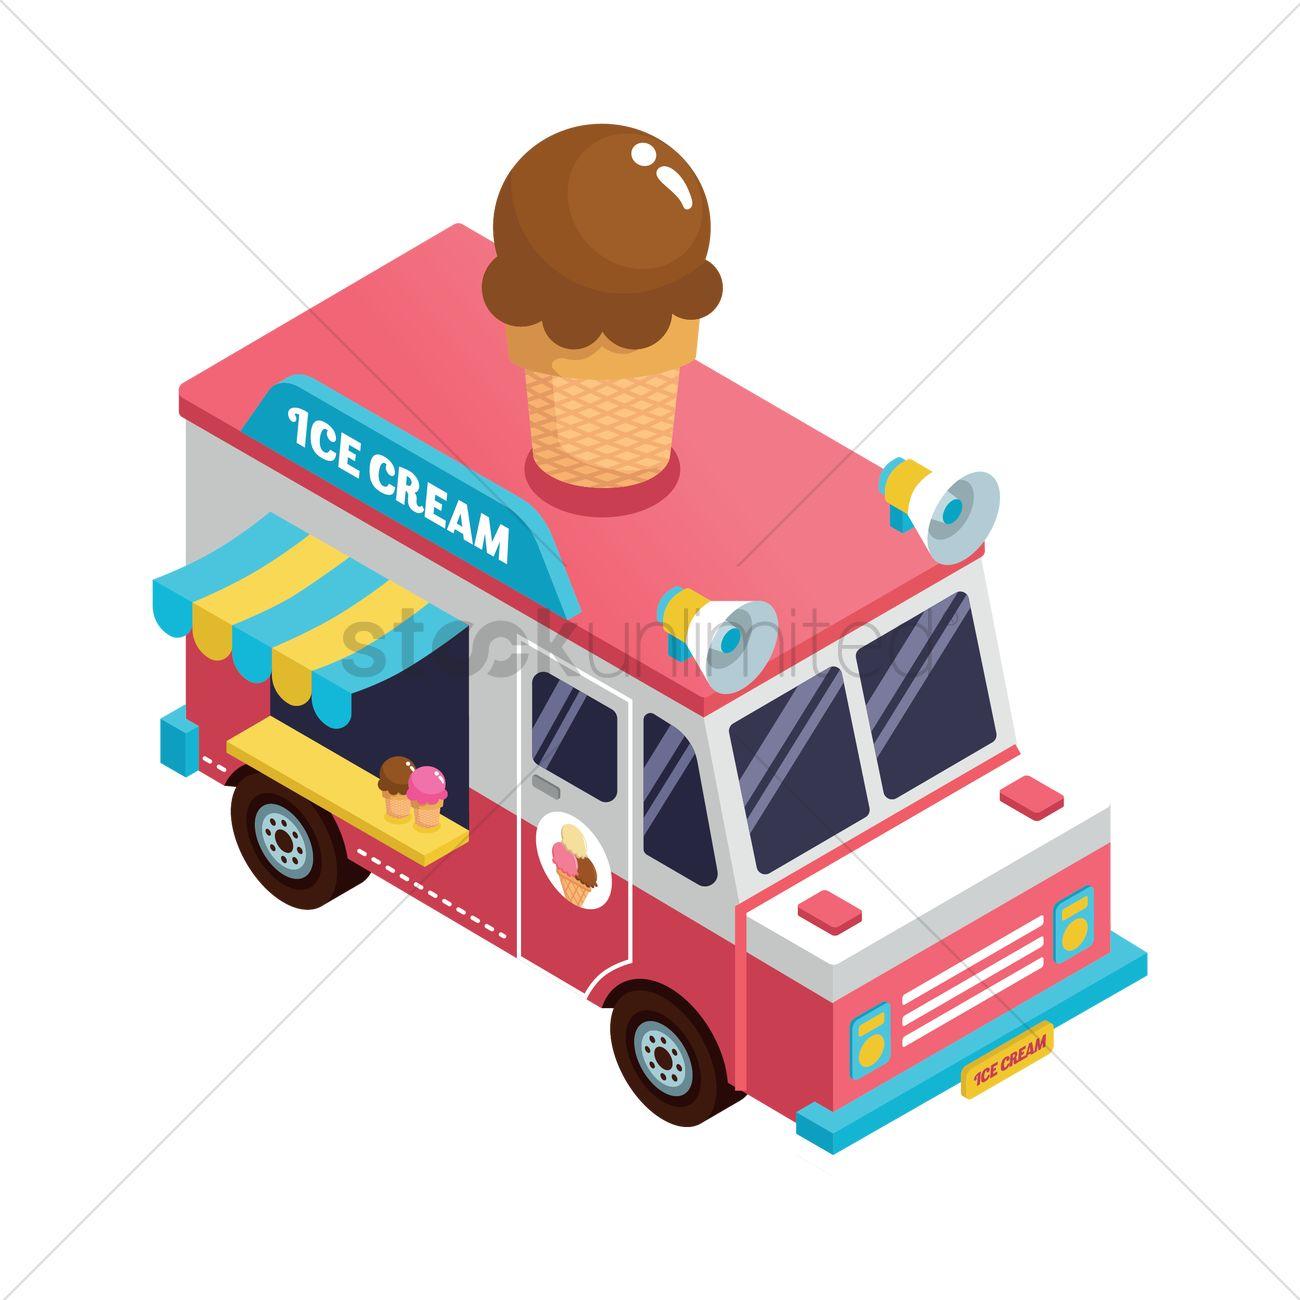 Ice cream truck Vector Image - 1572960 | StockUnlimited  Ice cream truck...